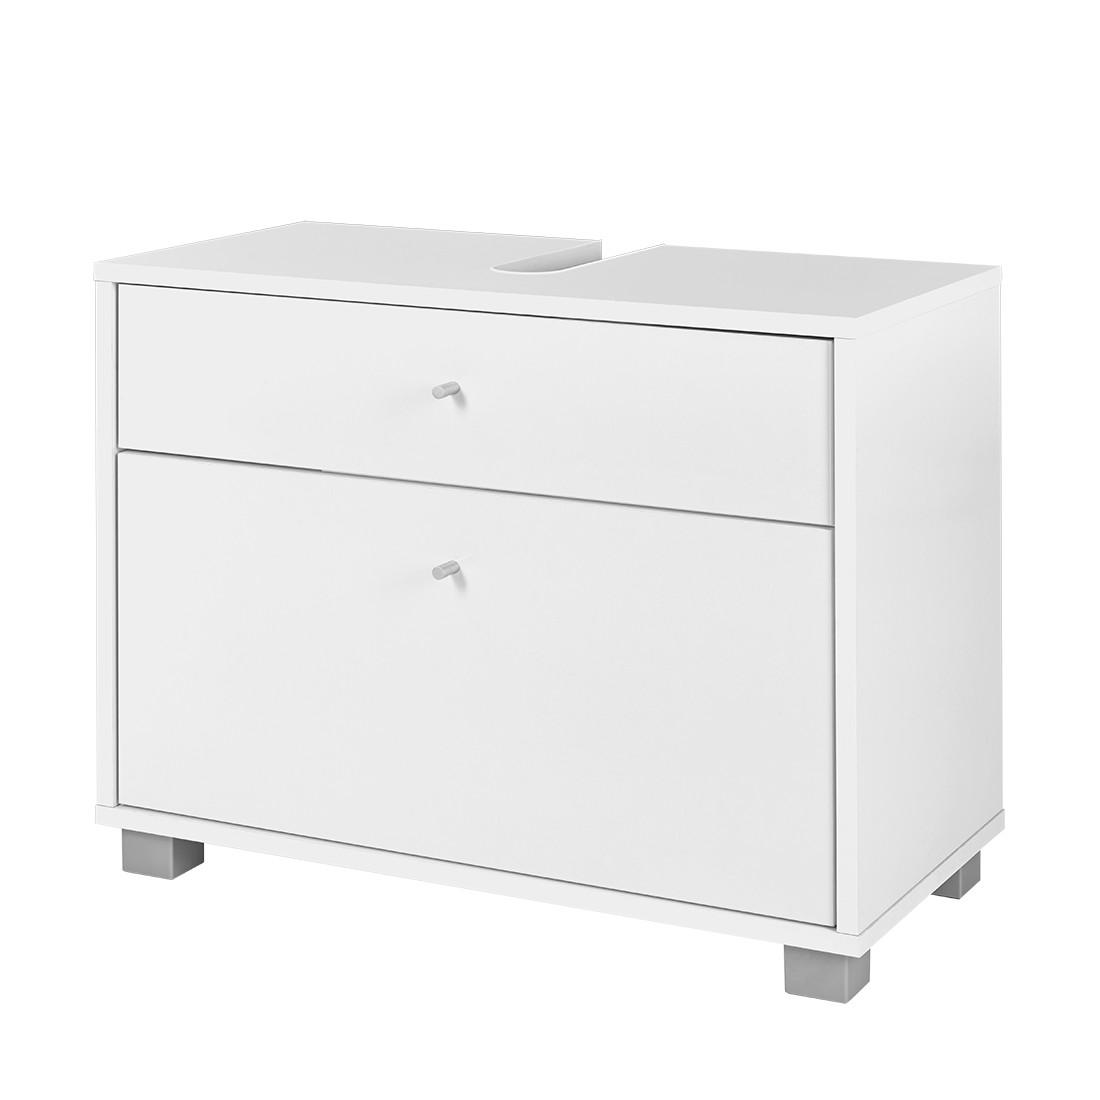 Mobile per lavabo Verna - Bianco lucido, Schildmeyer